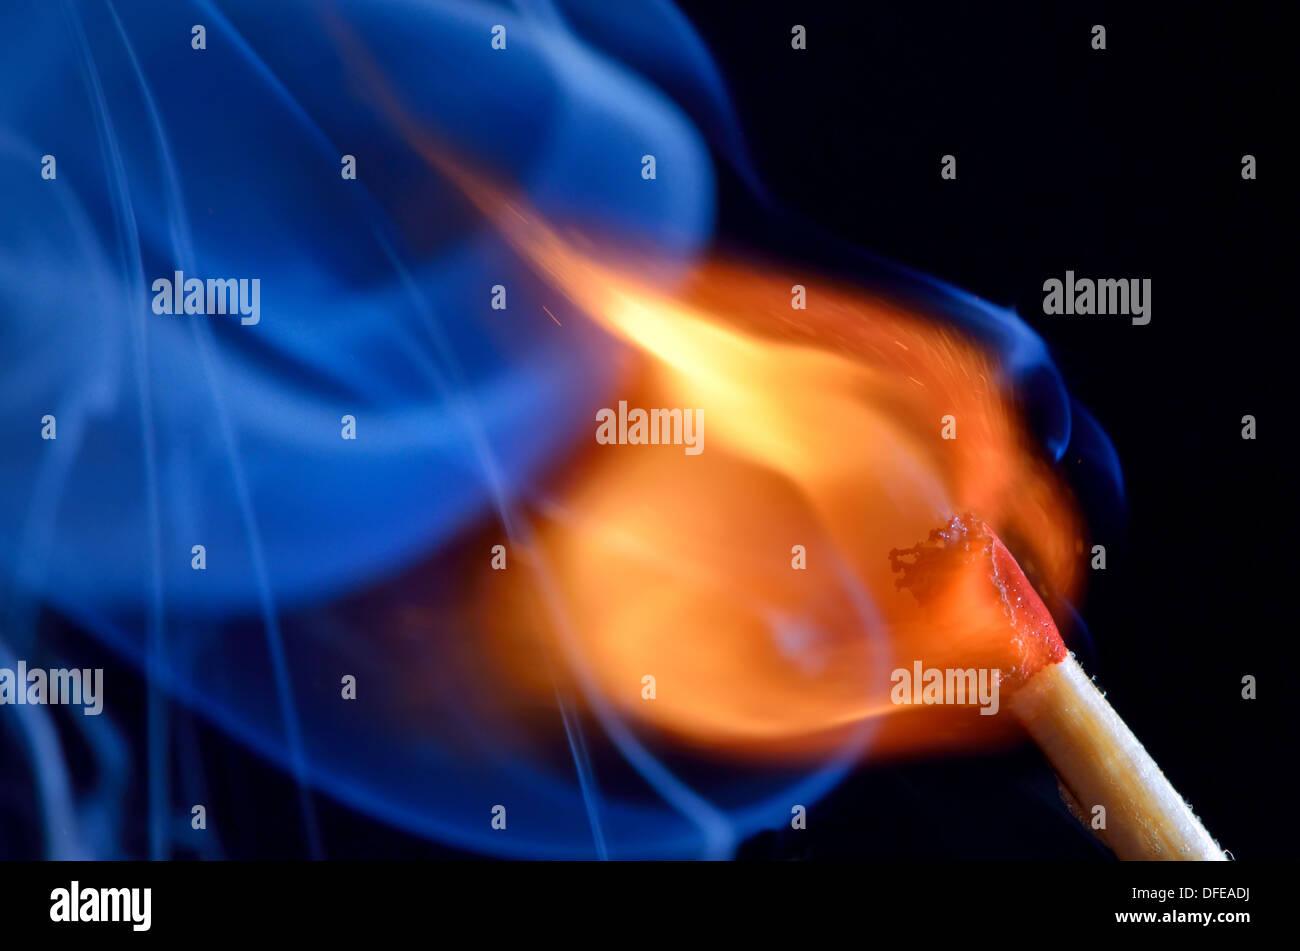 Match bursting to flame - Stock Image